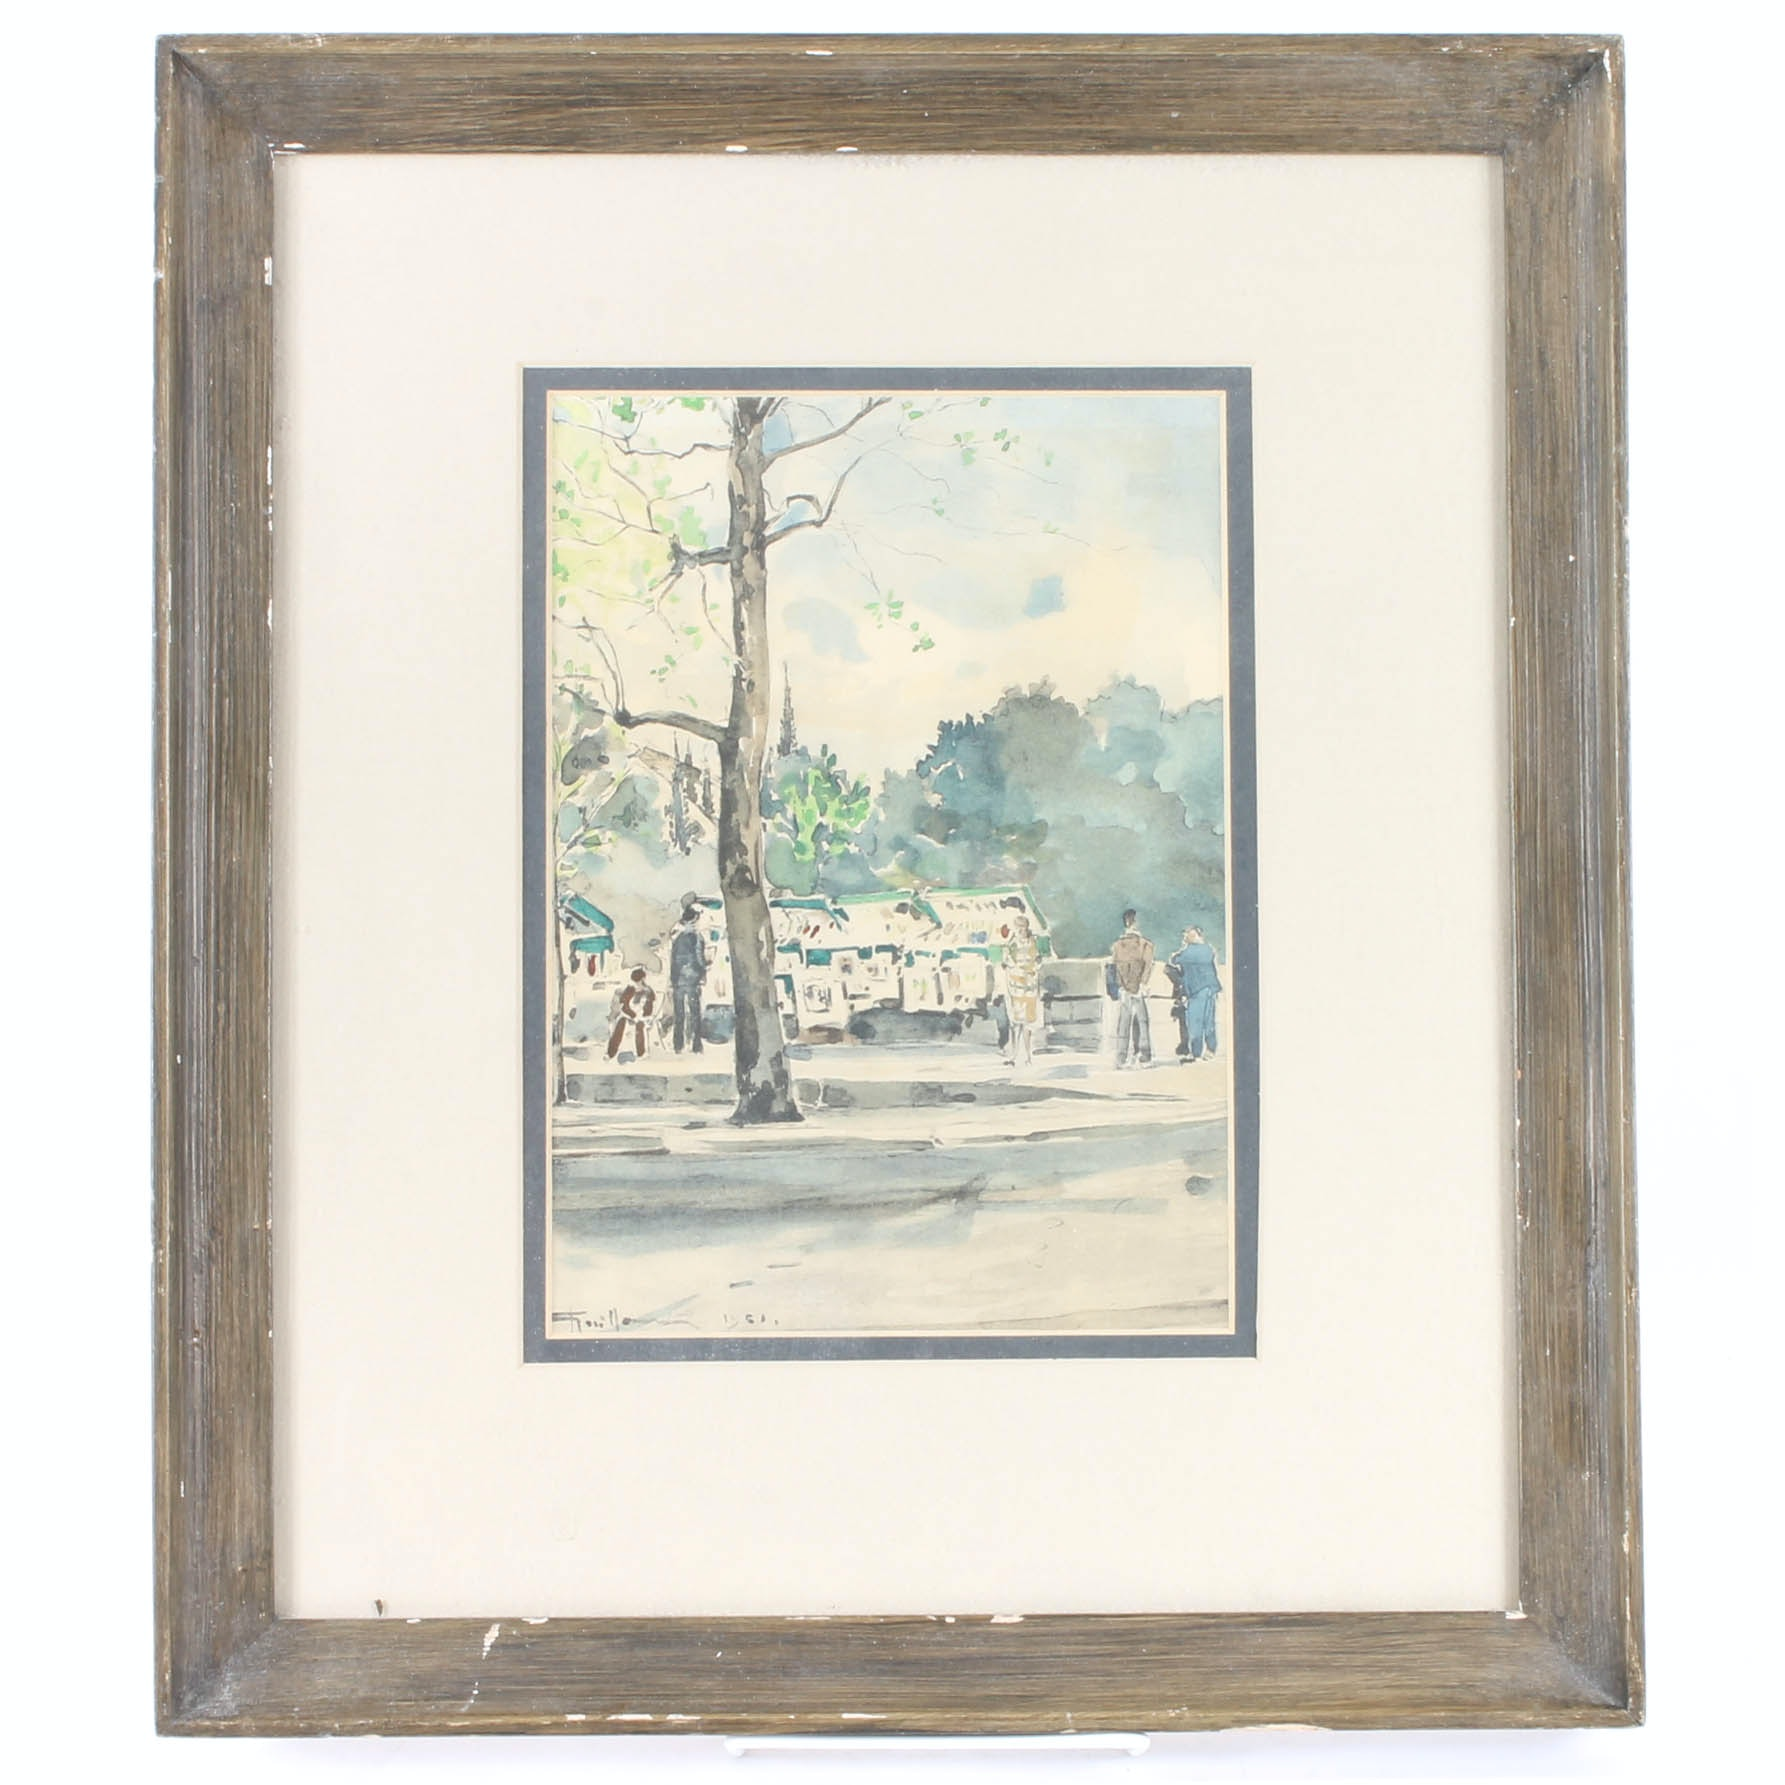 Framed Original Watercolor Painting